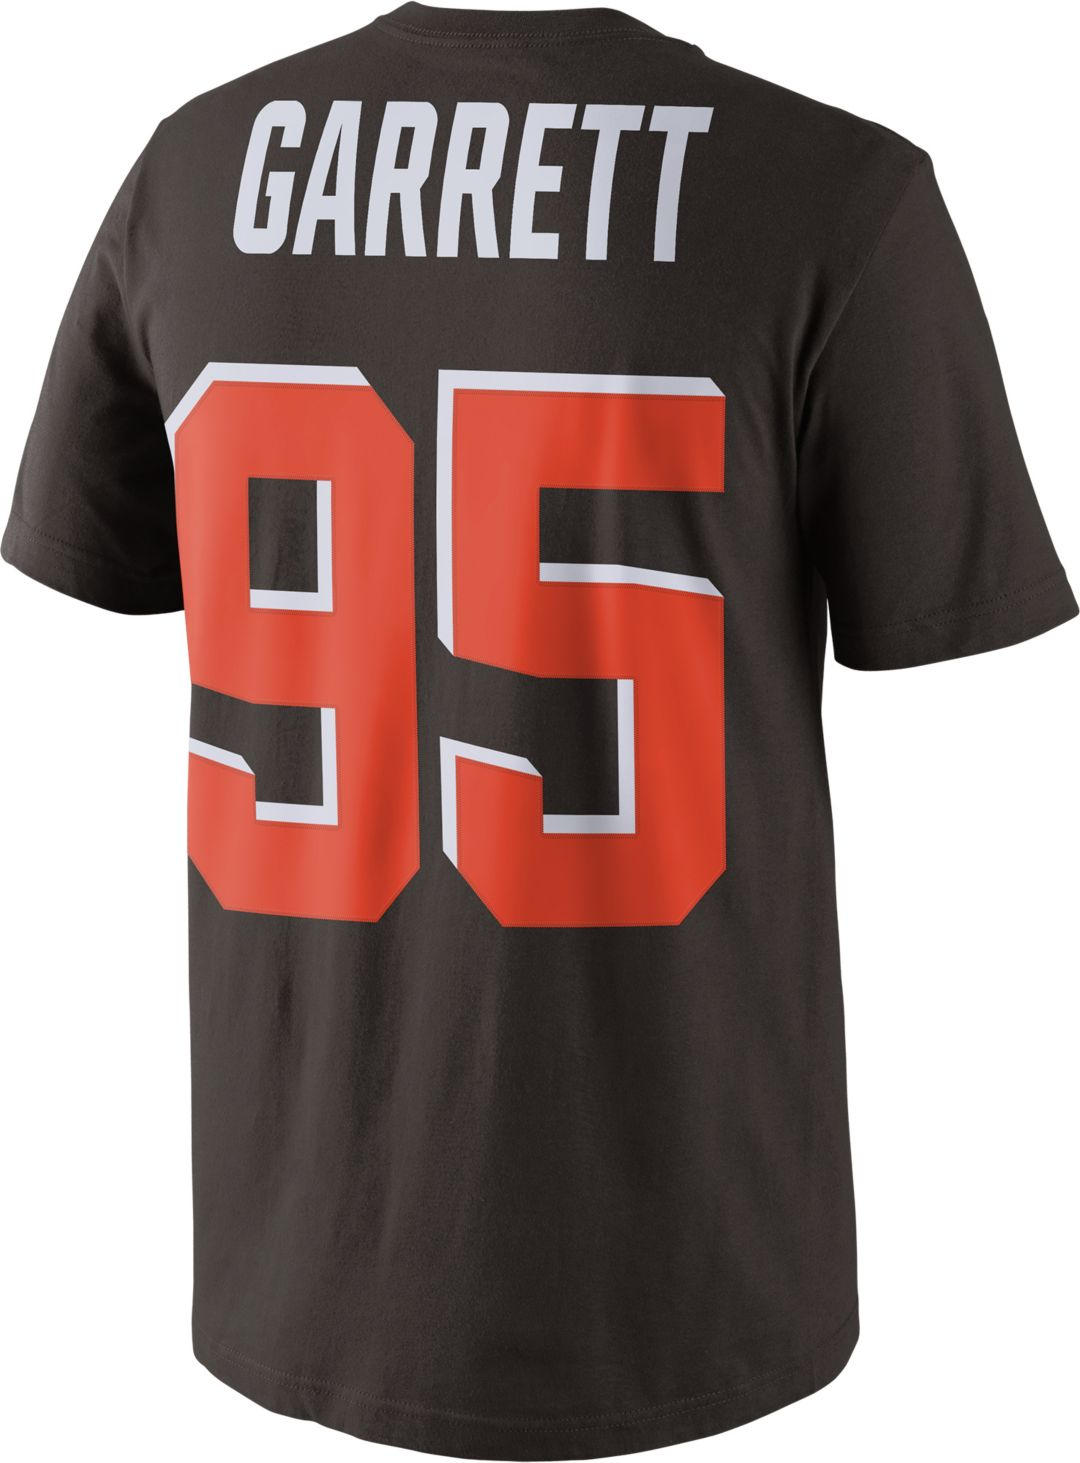 save off 88c8e 0b4a4 Nike Men's Cleveland Browns Myles Garrett #95 Pride Brown T-Shirt